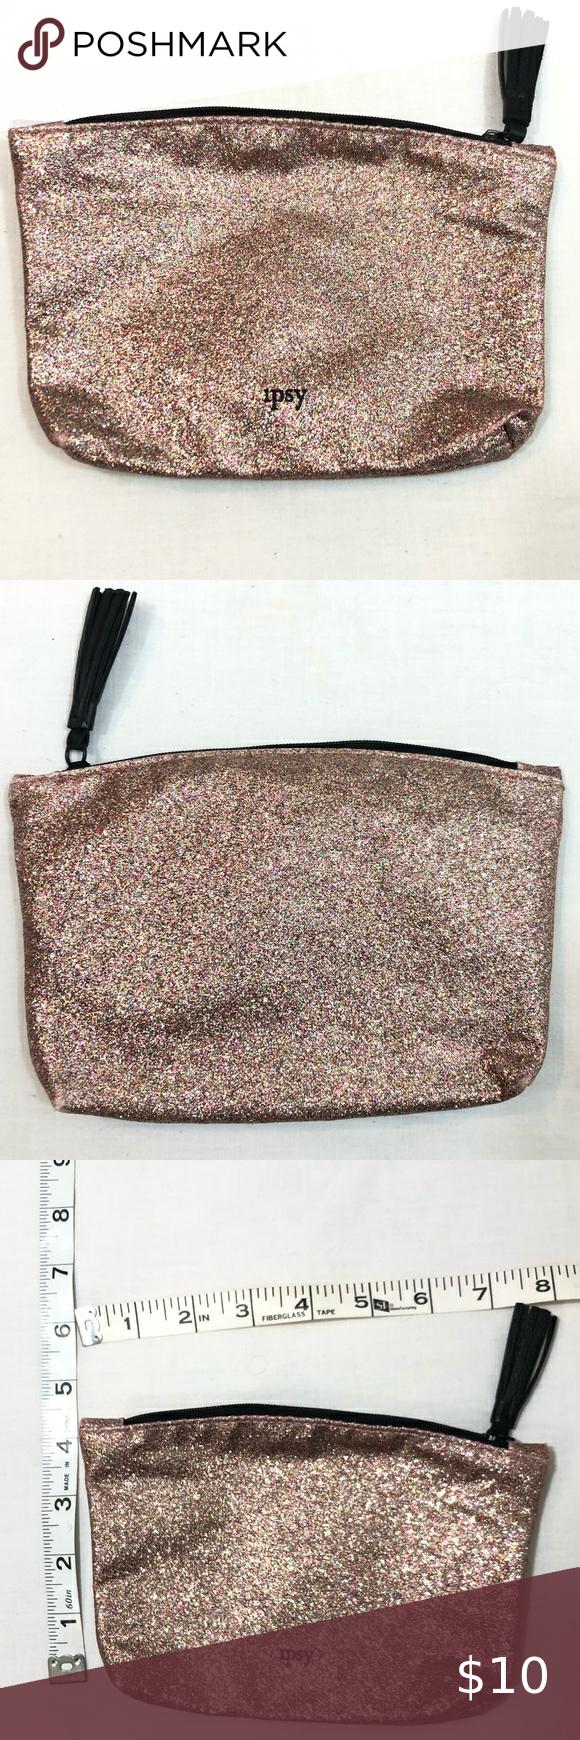 Ipsy glitter makeup cosmetic bag in 2020 Cosmetic bag